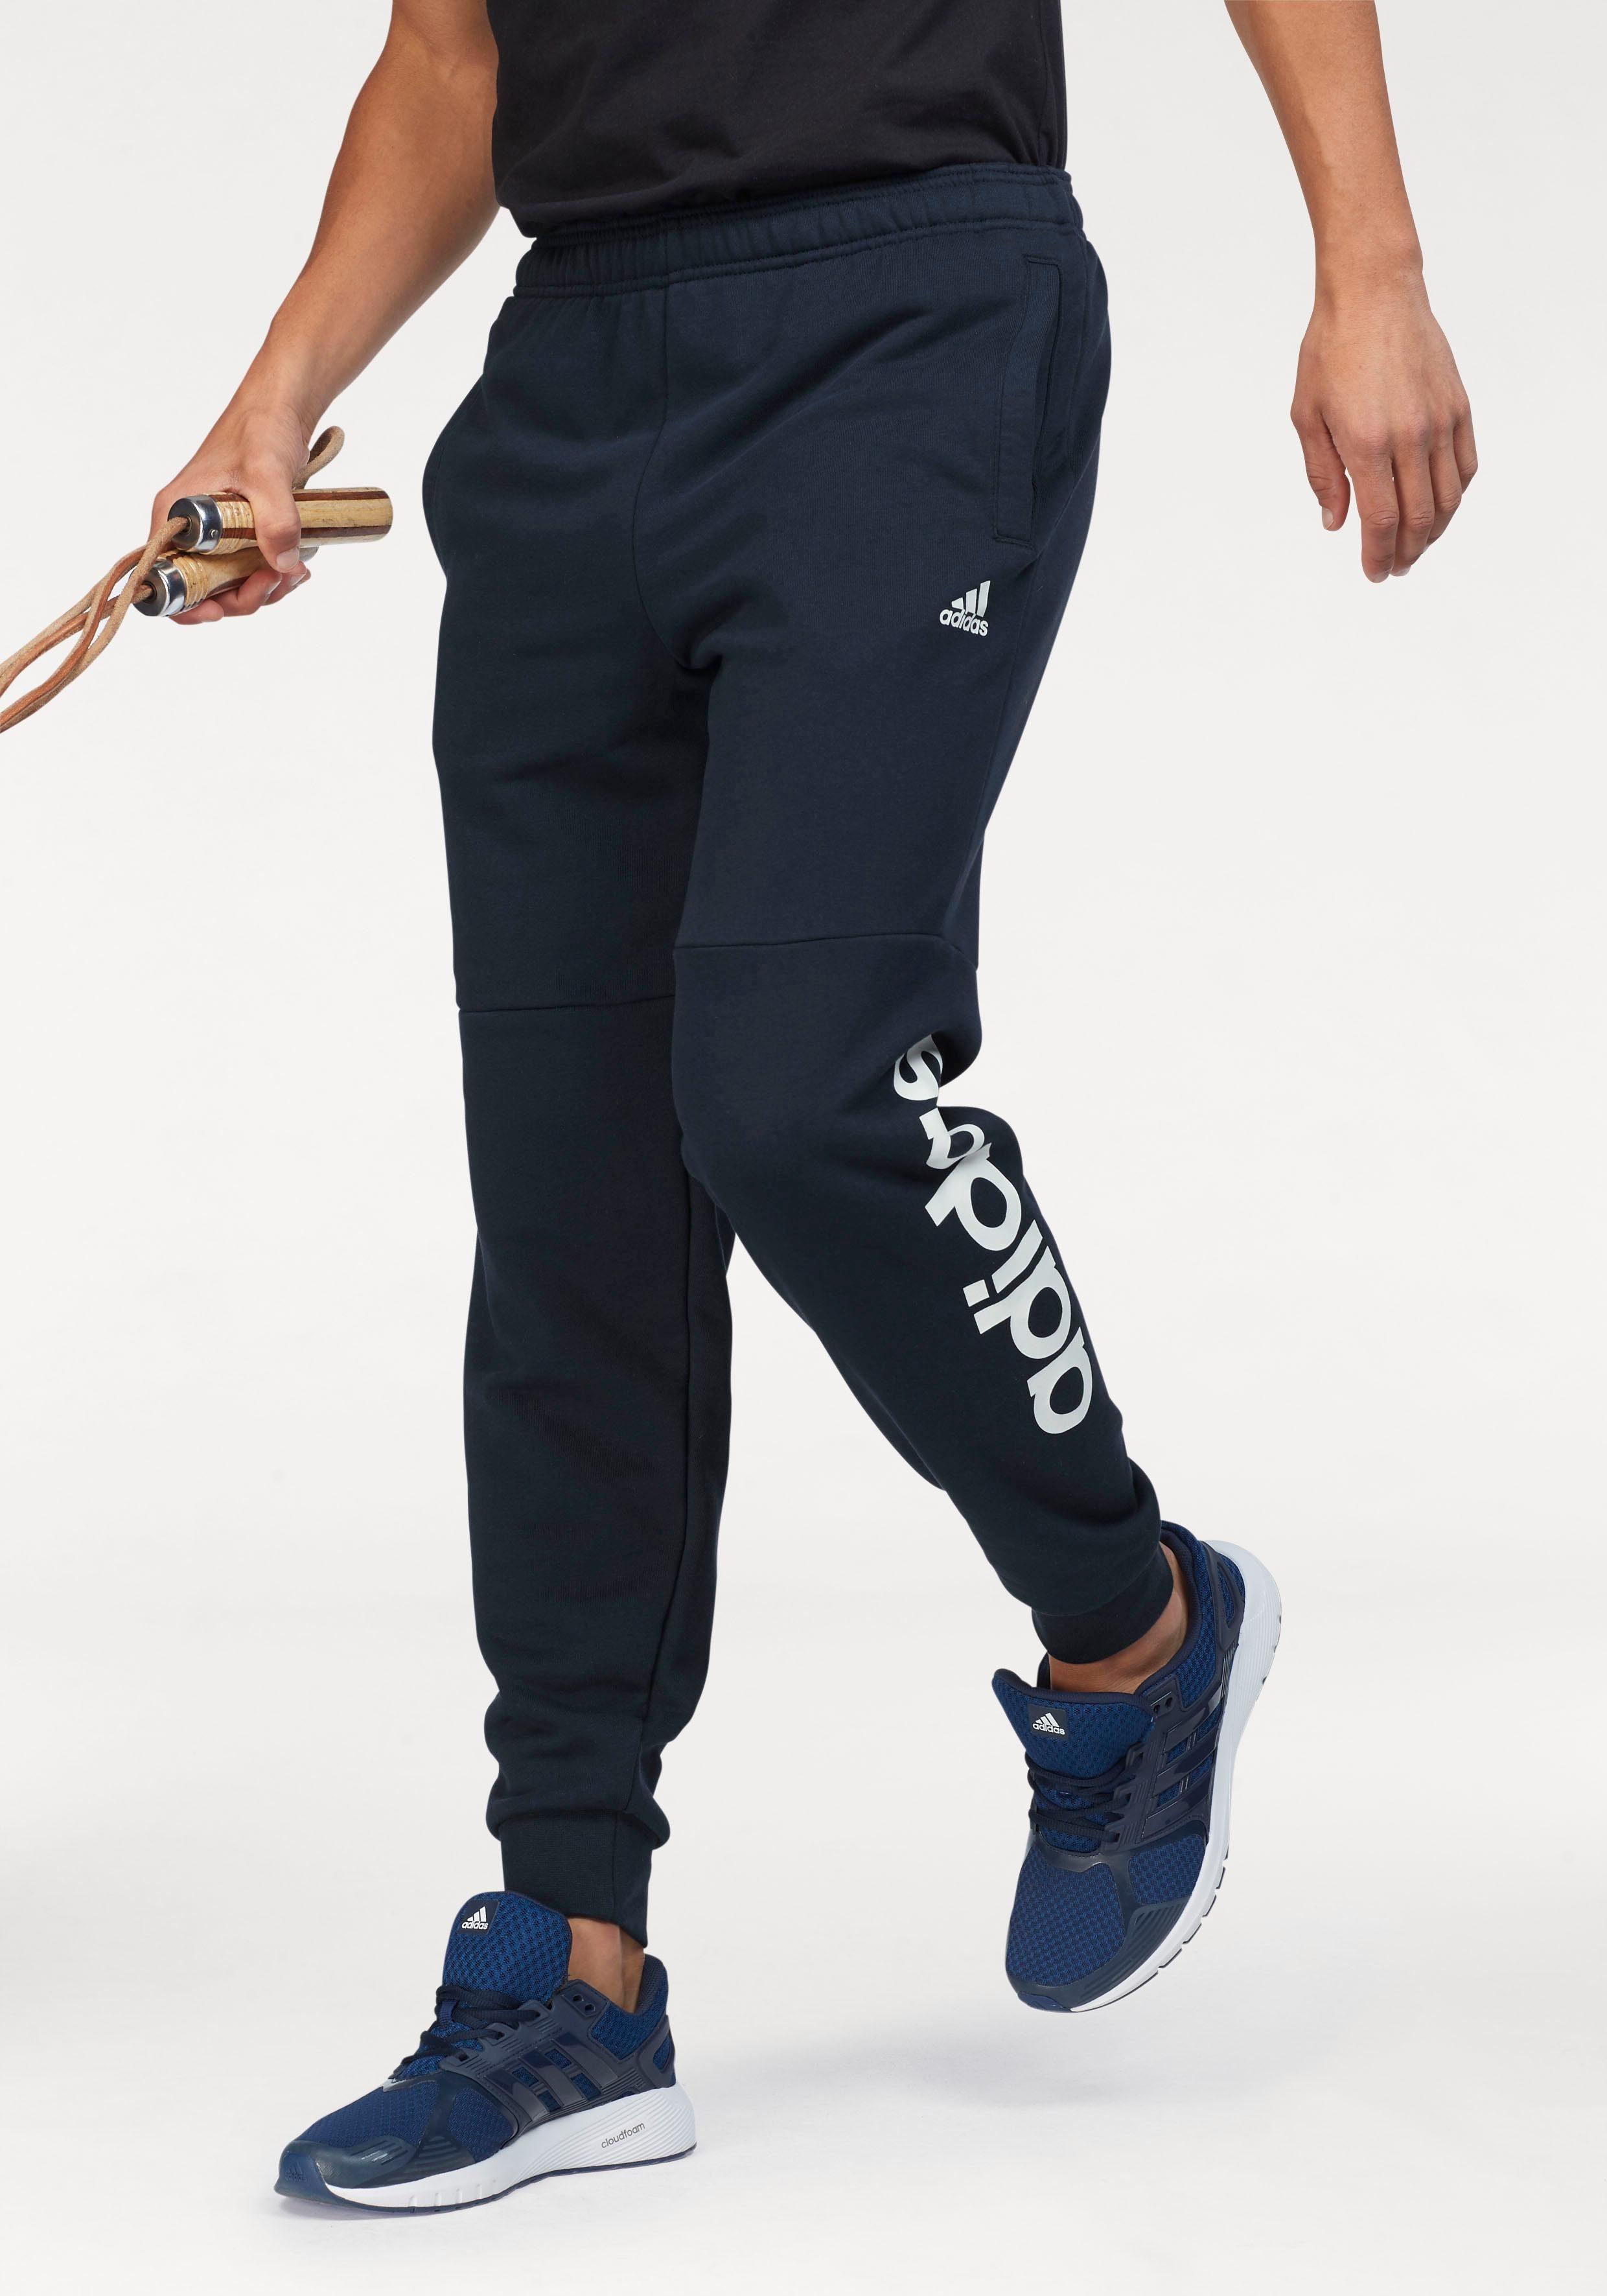 adidas Performance Jogginghose »ESSENTIALS LINEAR TAPERED PANT FRENCH TERRY« mit Logoschriftzug am Hosenbein online kaufen | OTTO